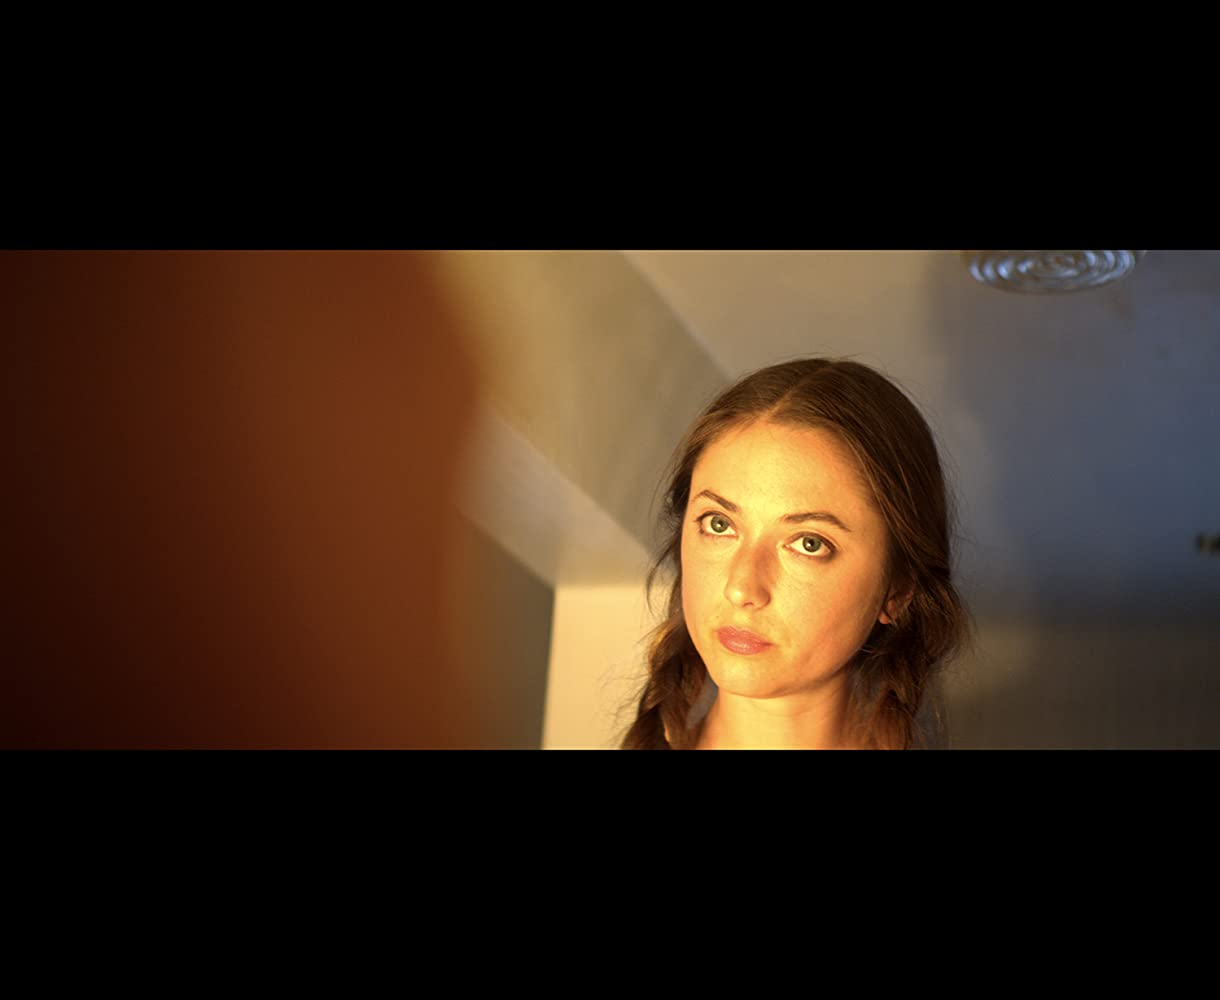 Mela Hudson,Rachel Grant Erotic video Idris Elba (born 1972),Sunshine Garcia (b. 1985)